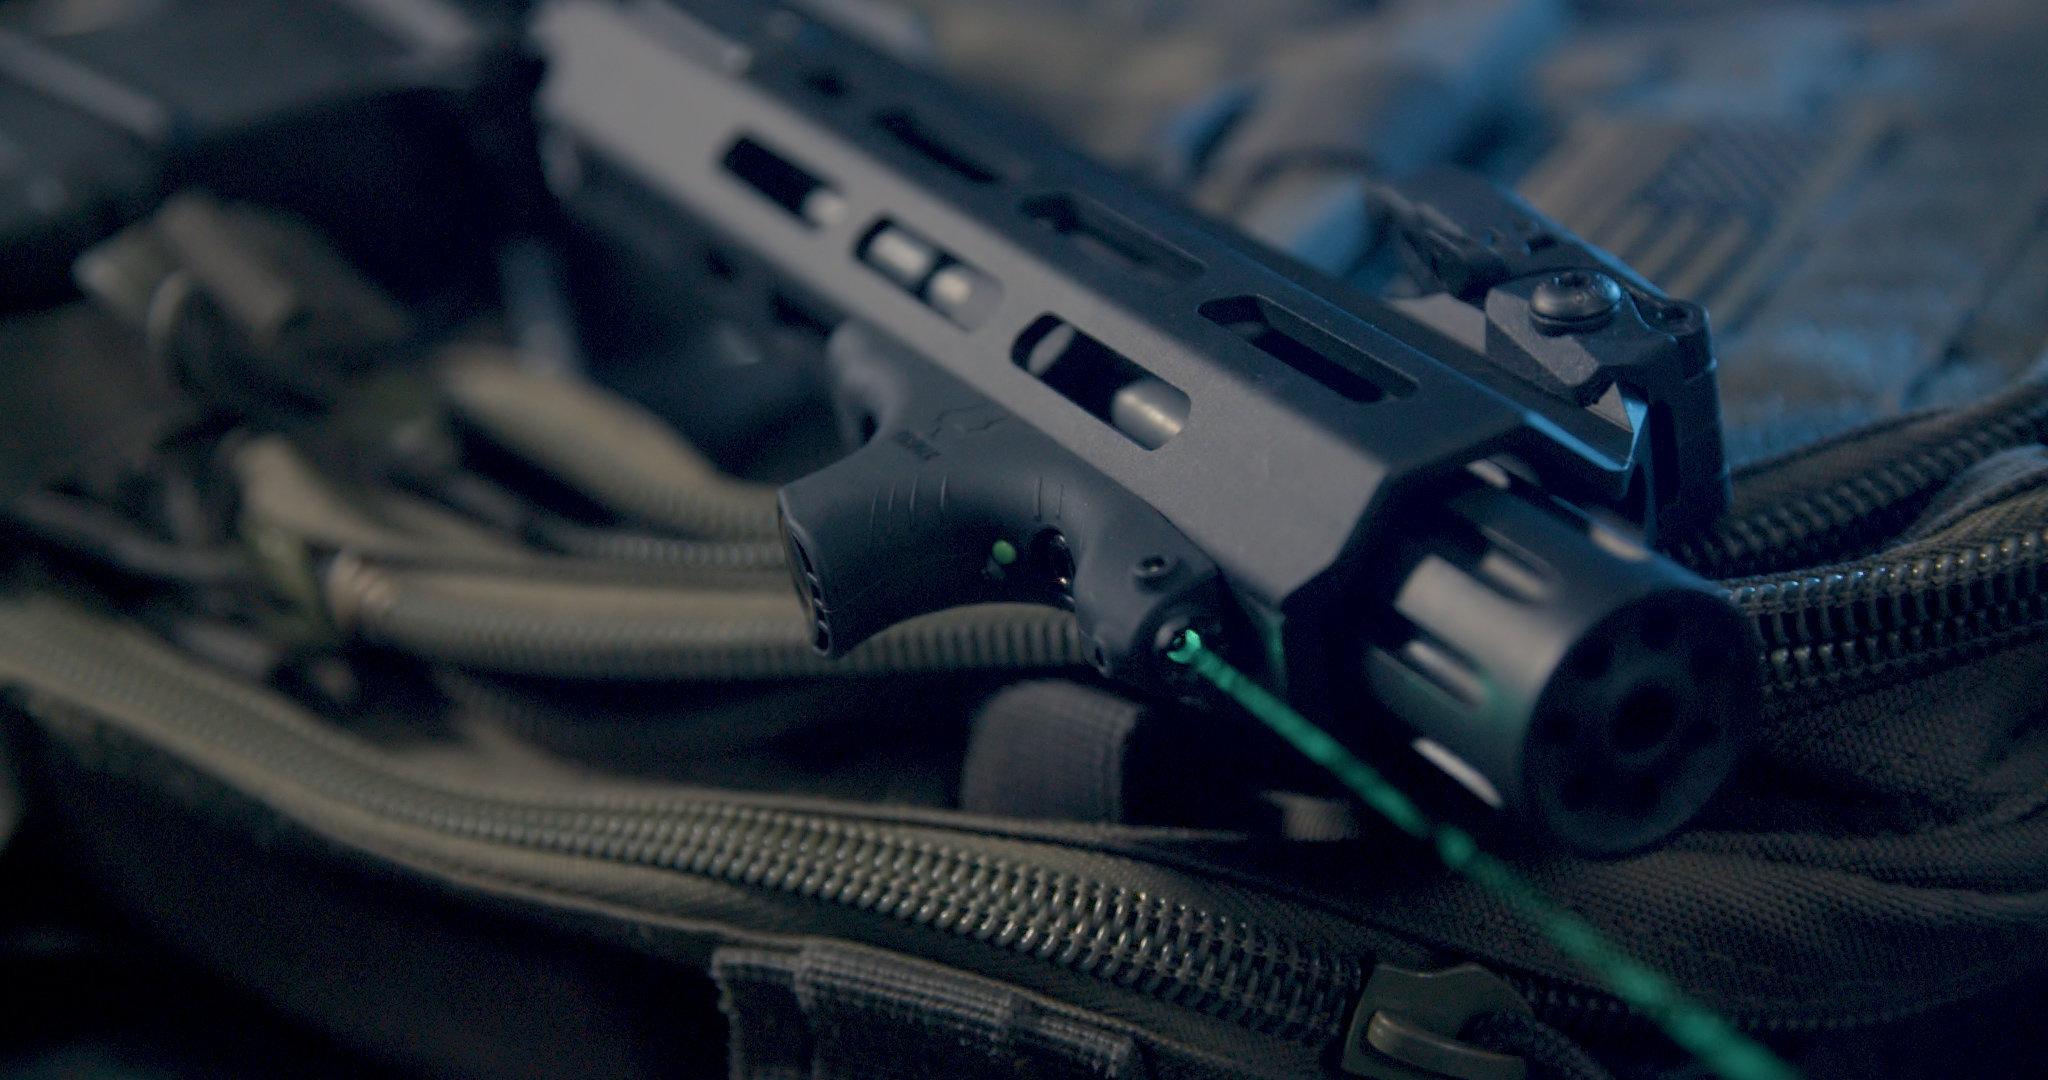 Viridian HS1 Hand Stop Laser